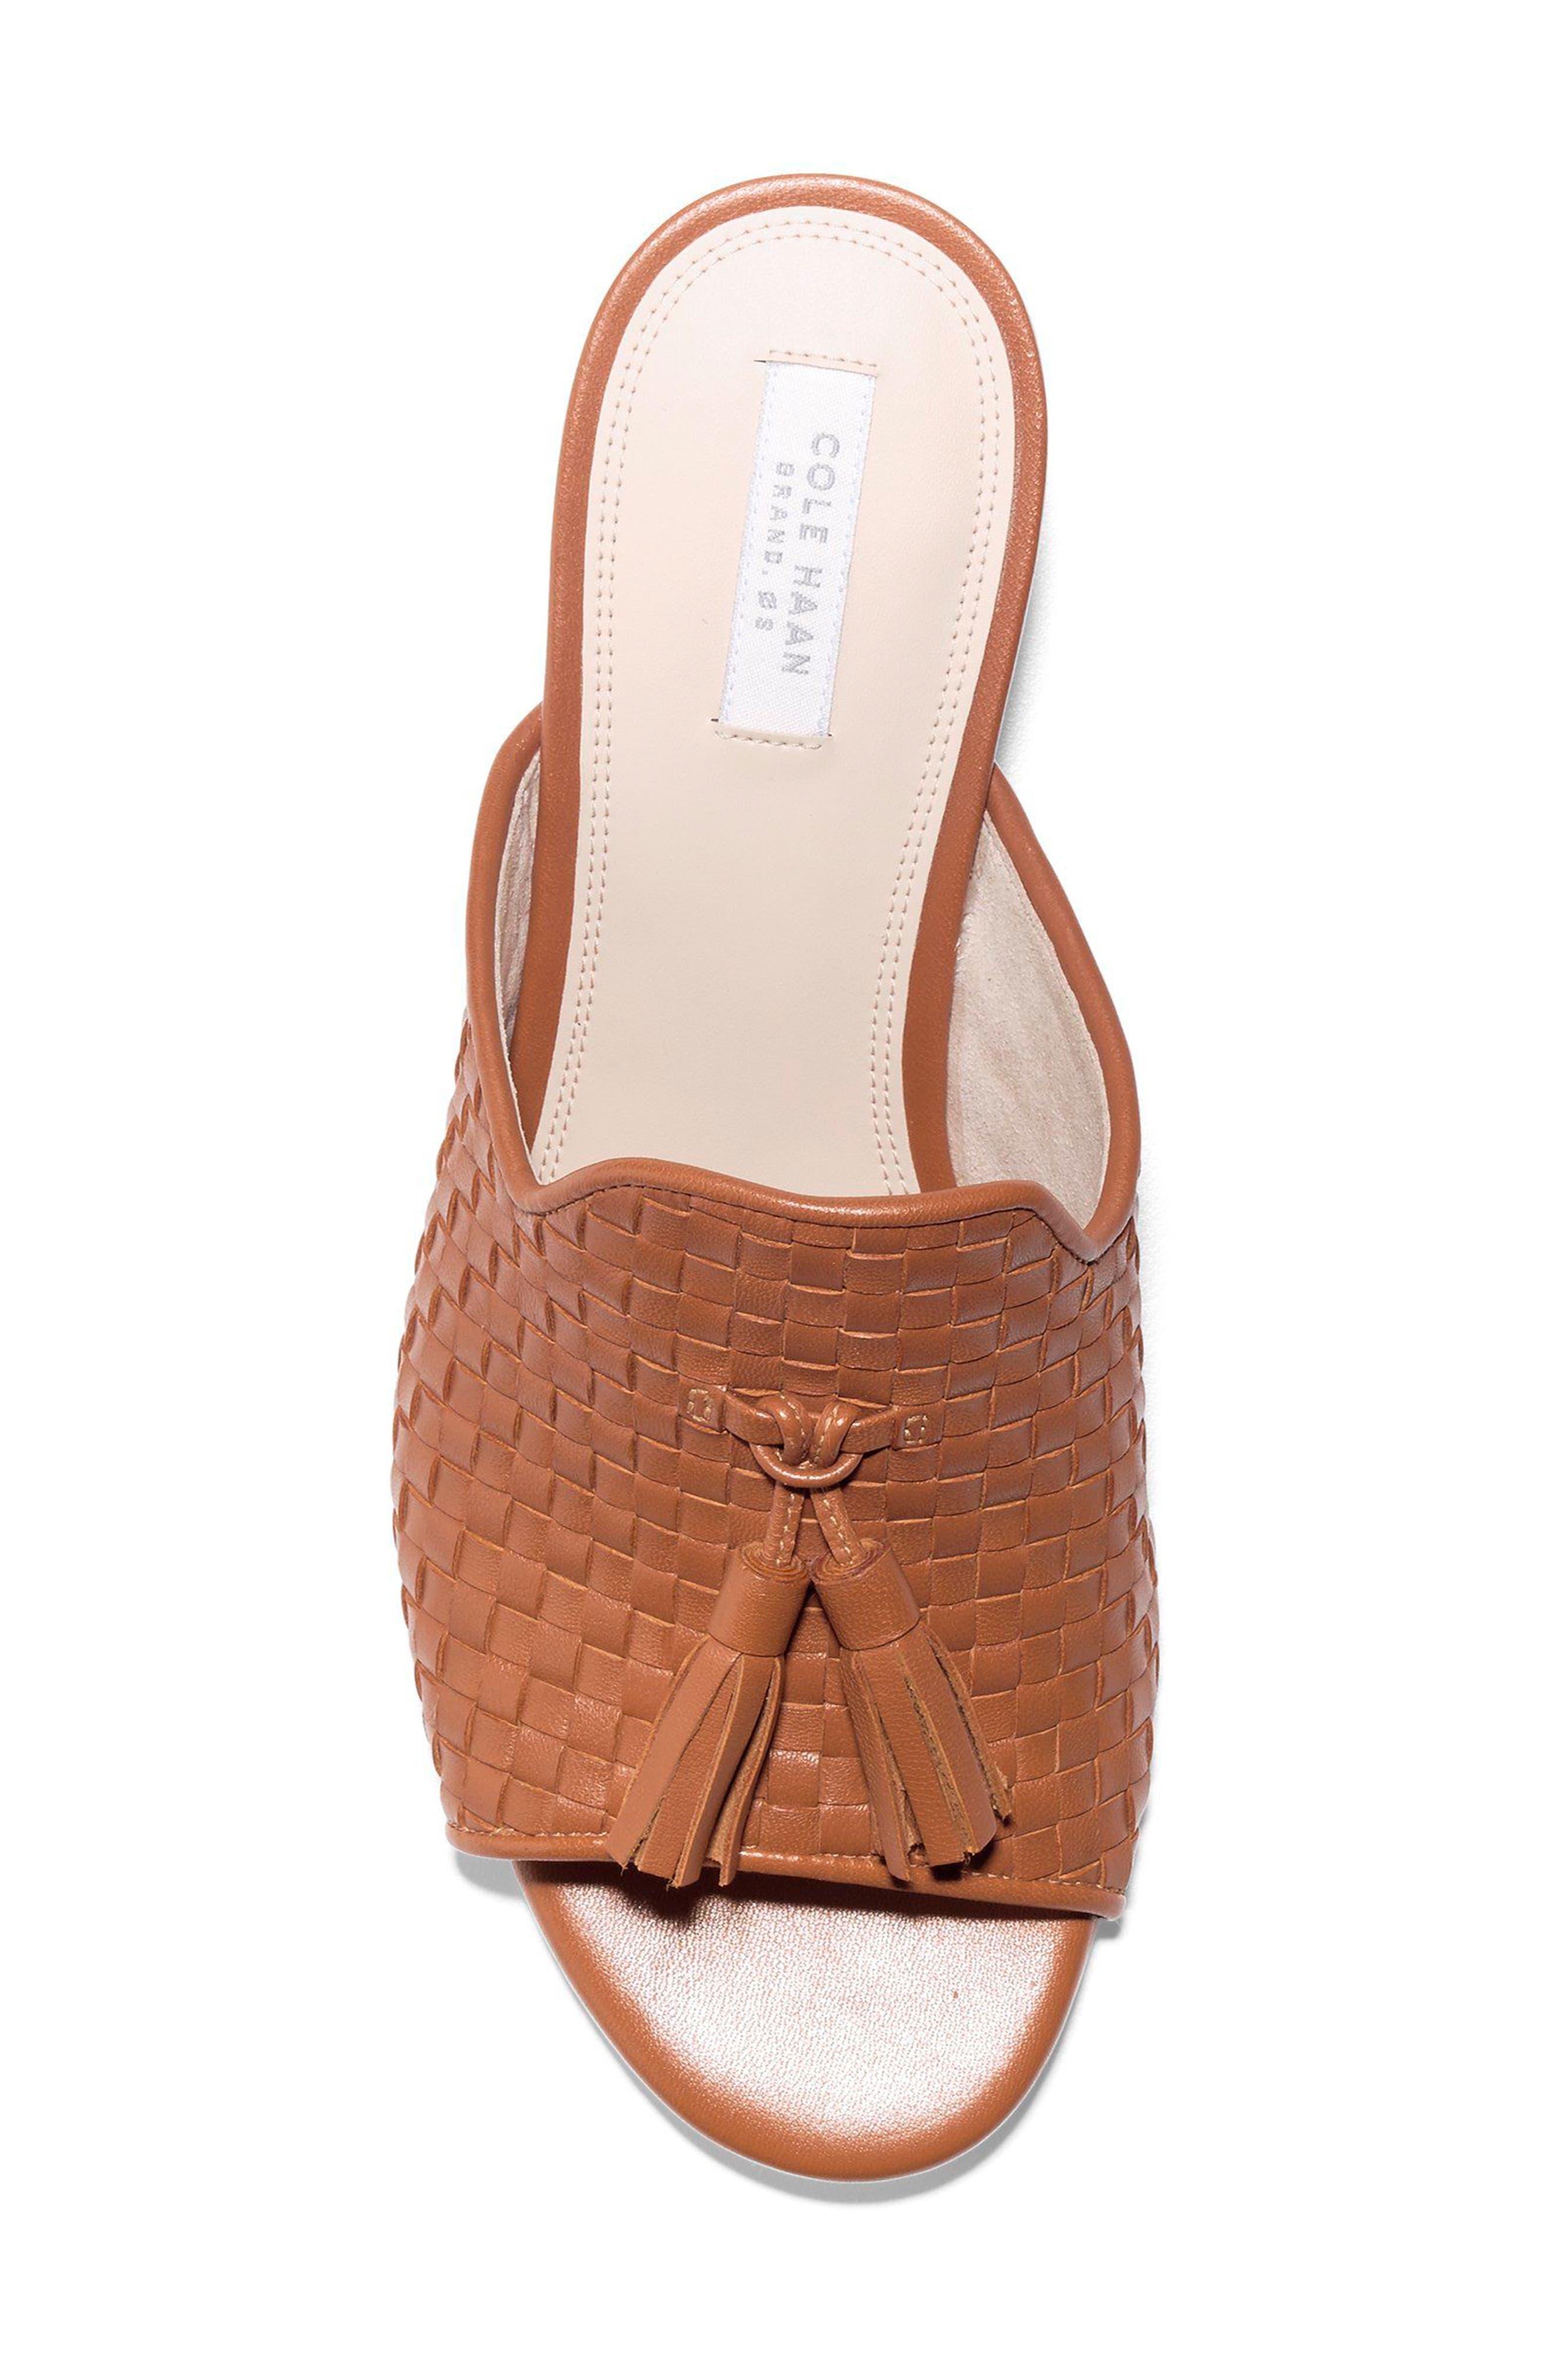 Jagger Wedge Sandal,                             Alternate thumbnail 5, color,                             Acorn Leather